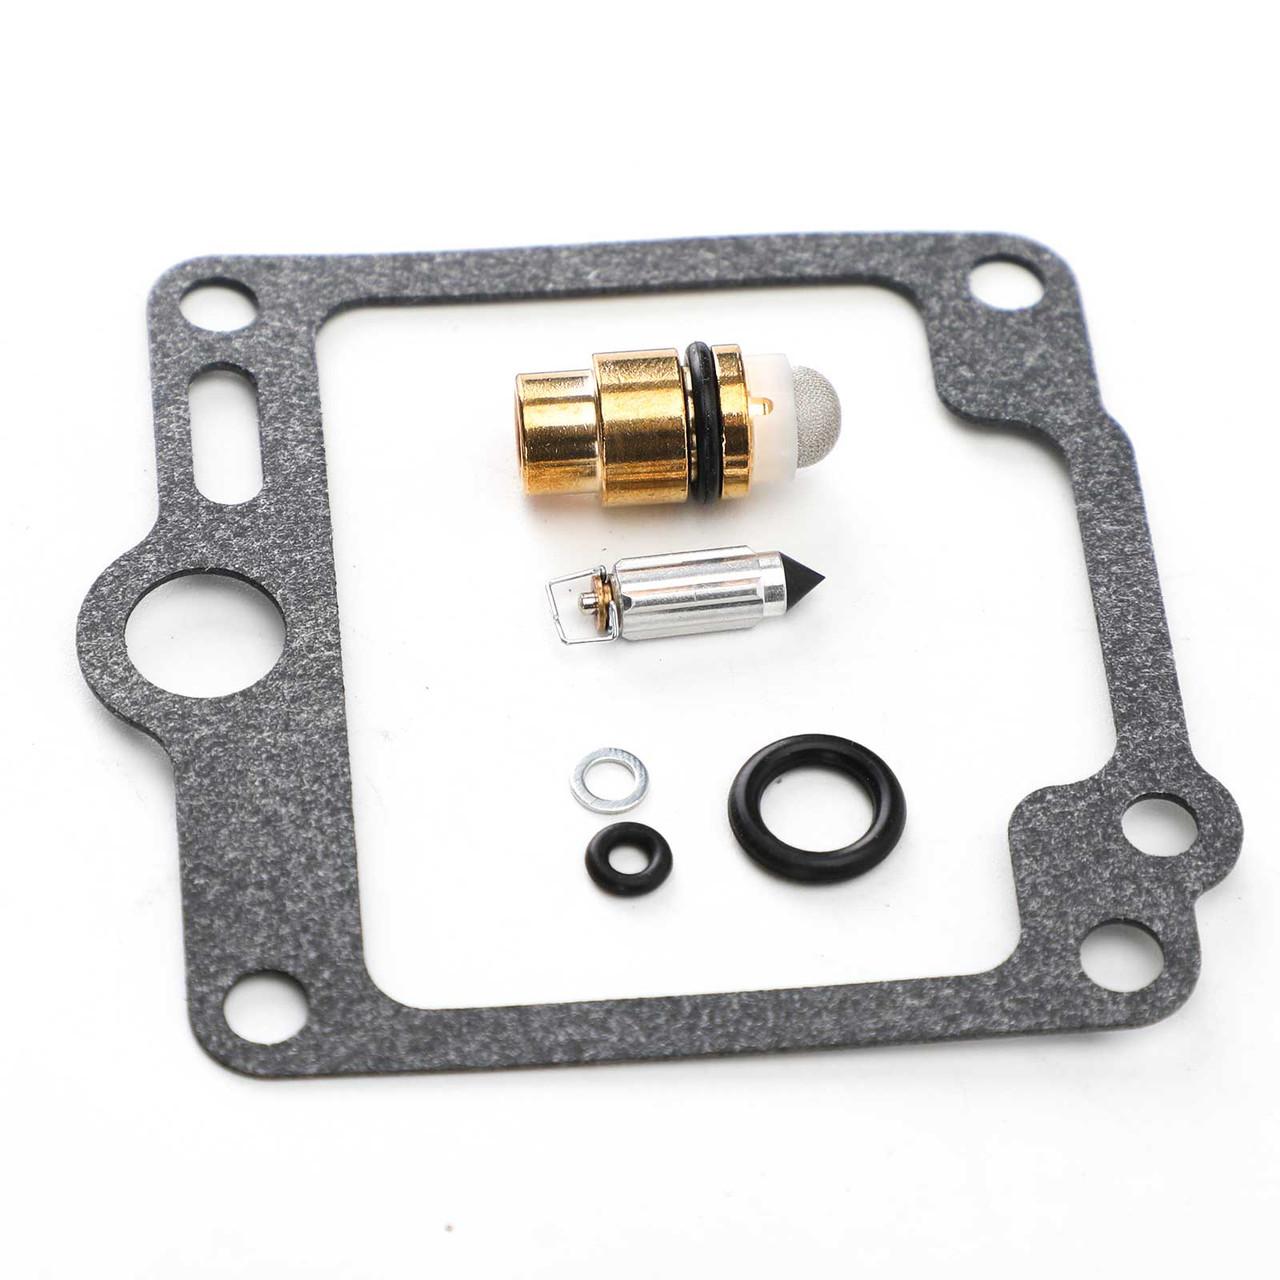 Carburetor Repair Kit Floating Needle Gasket Parts Fit For Yamaha XJ600N-51J XJ600H-51J 1984-1990